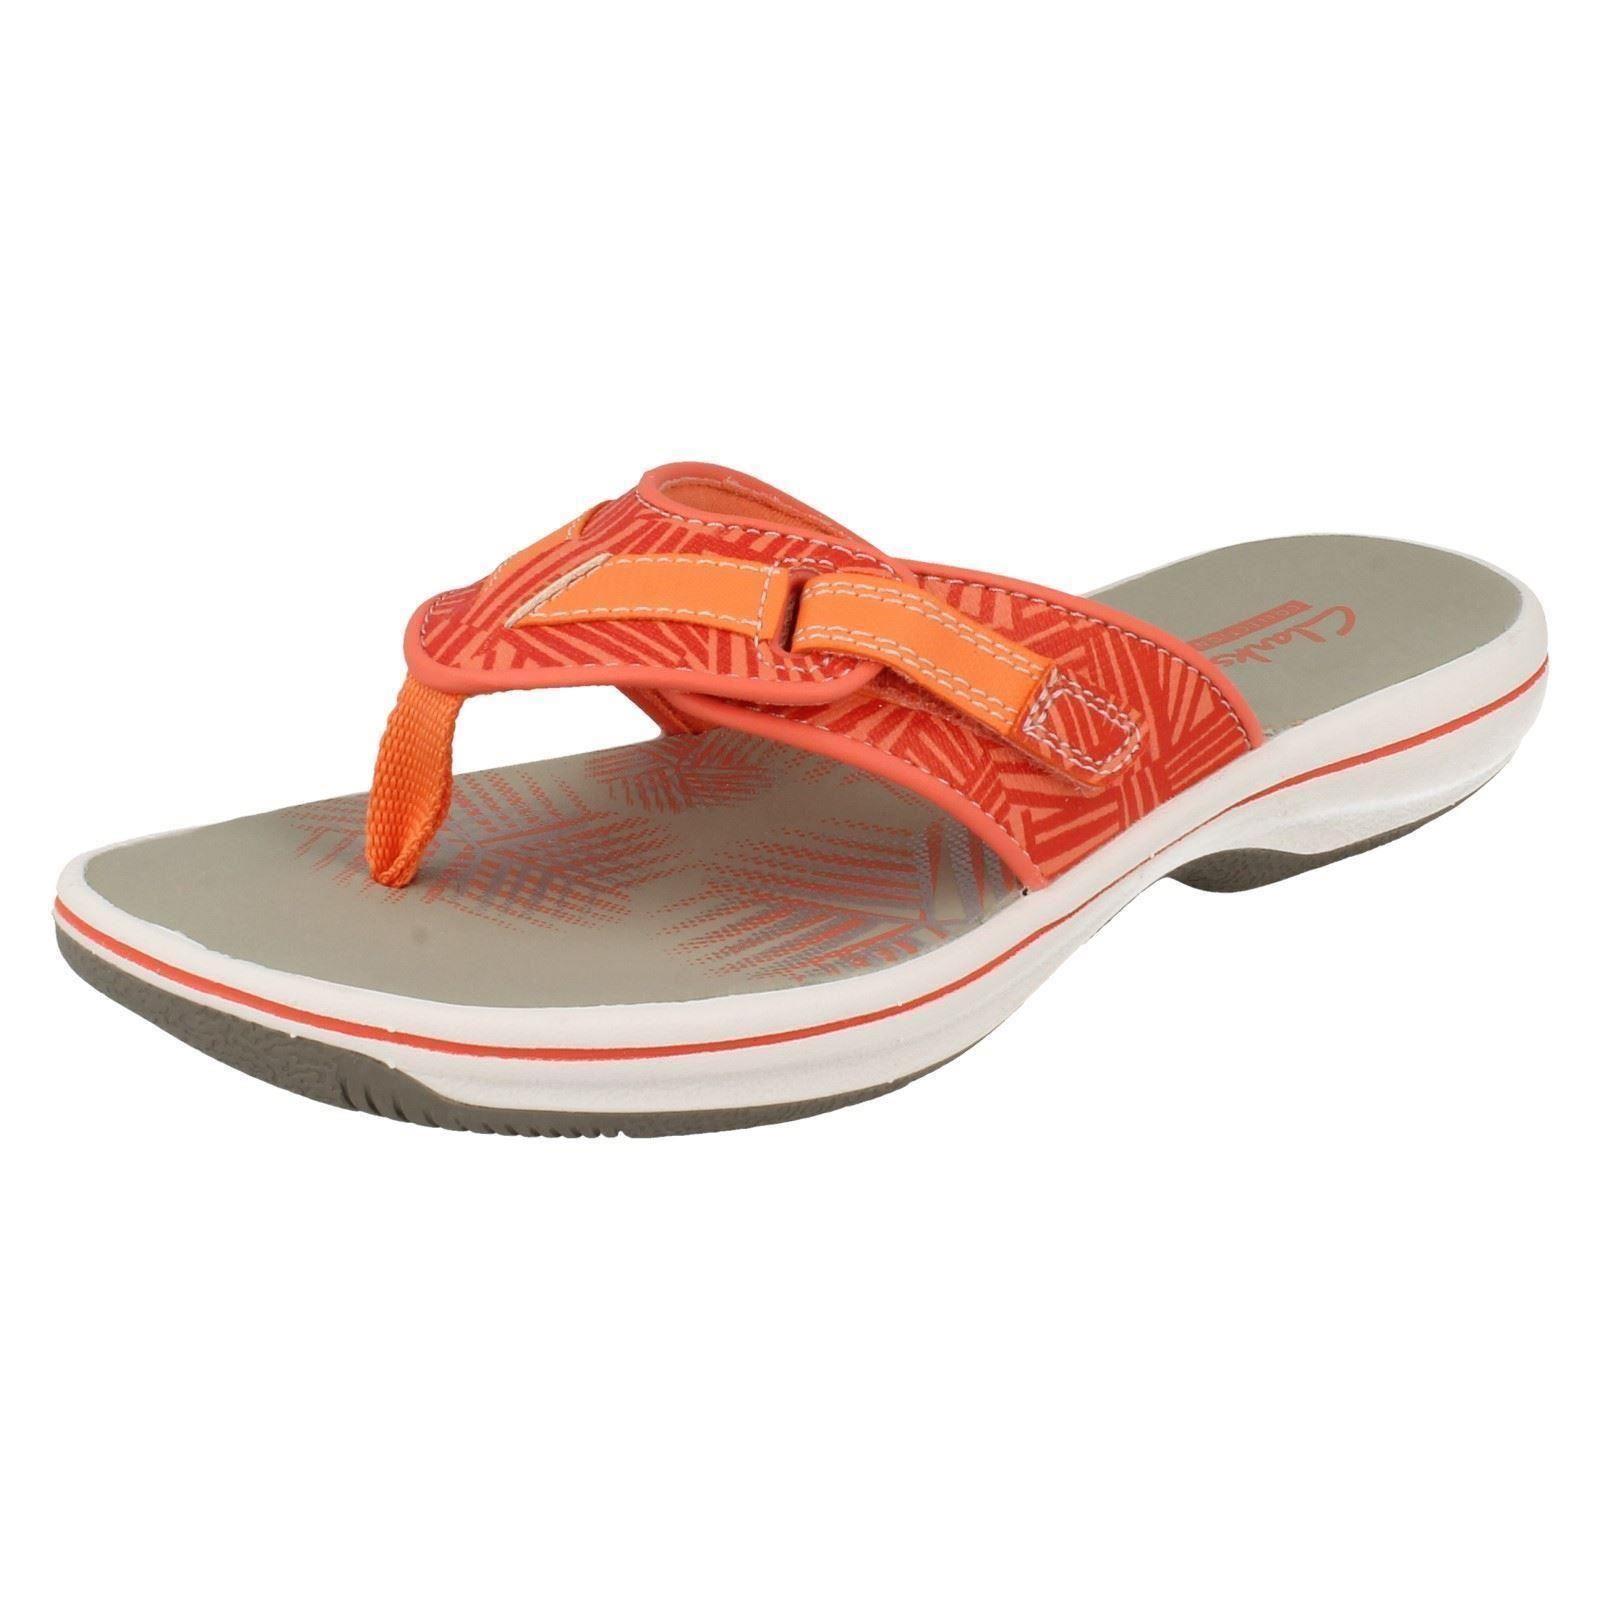 Sandalias para naranja mujer Toe Quade Summer Clarks Post Brinkley rpY8Ar